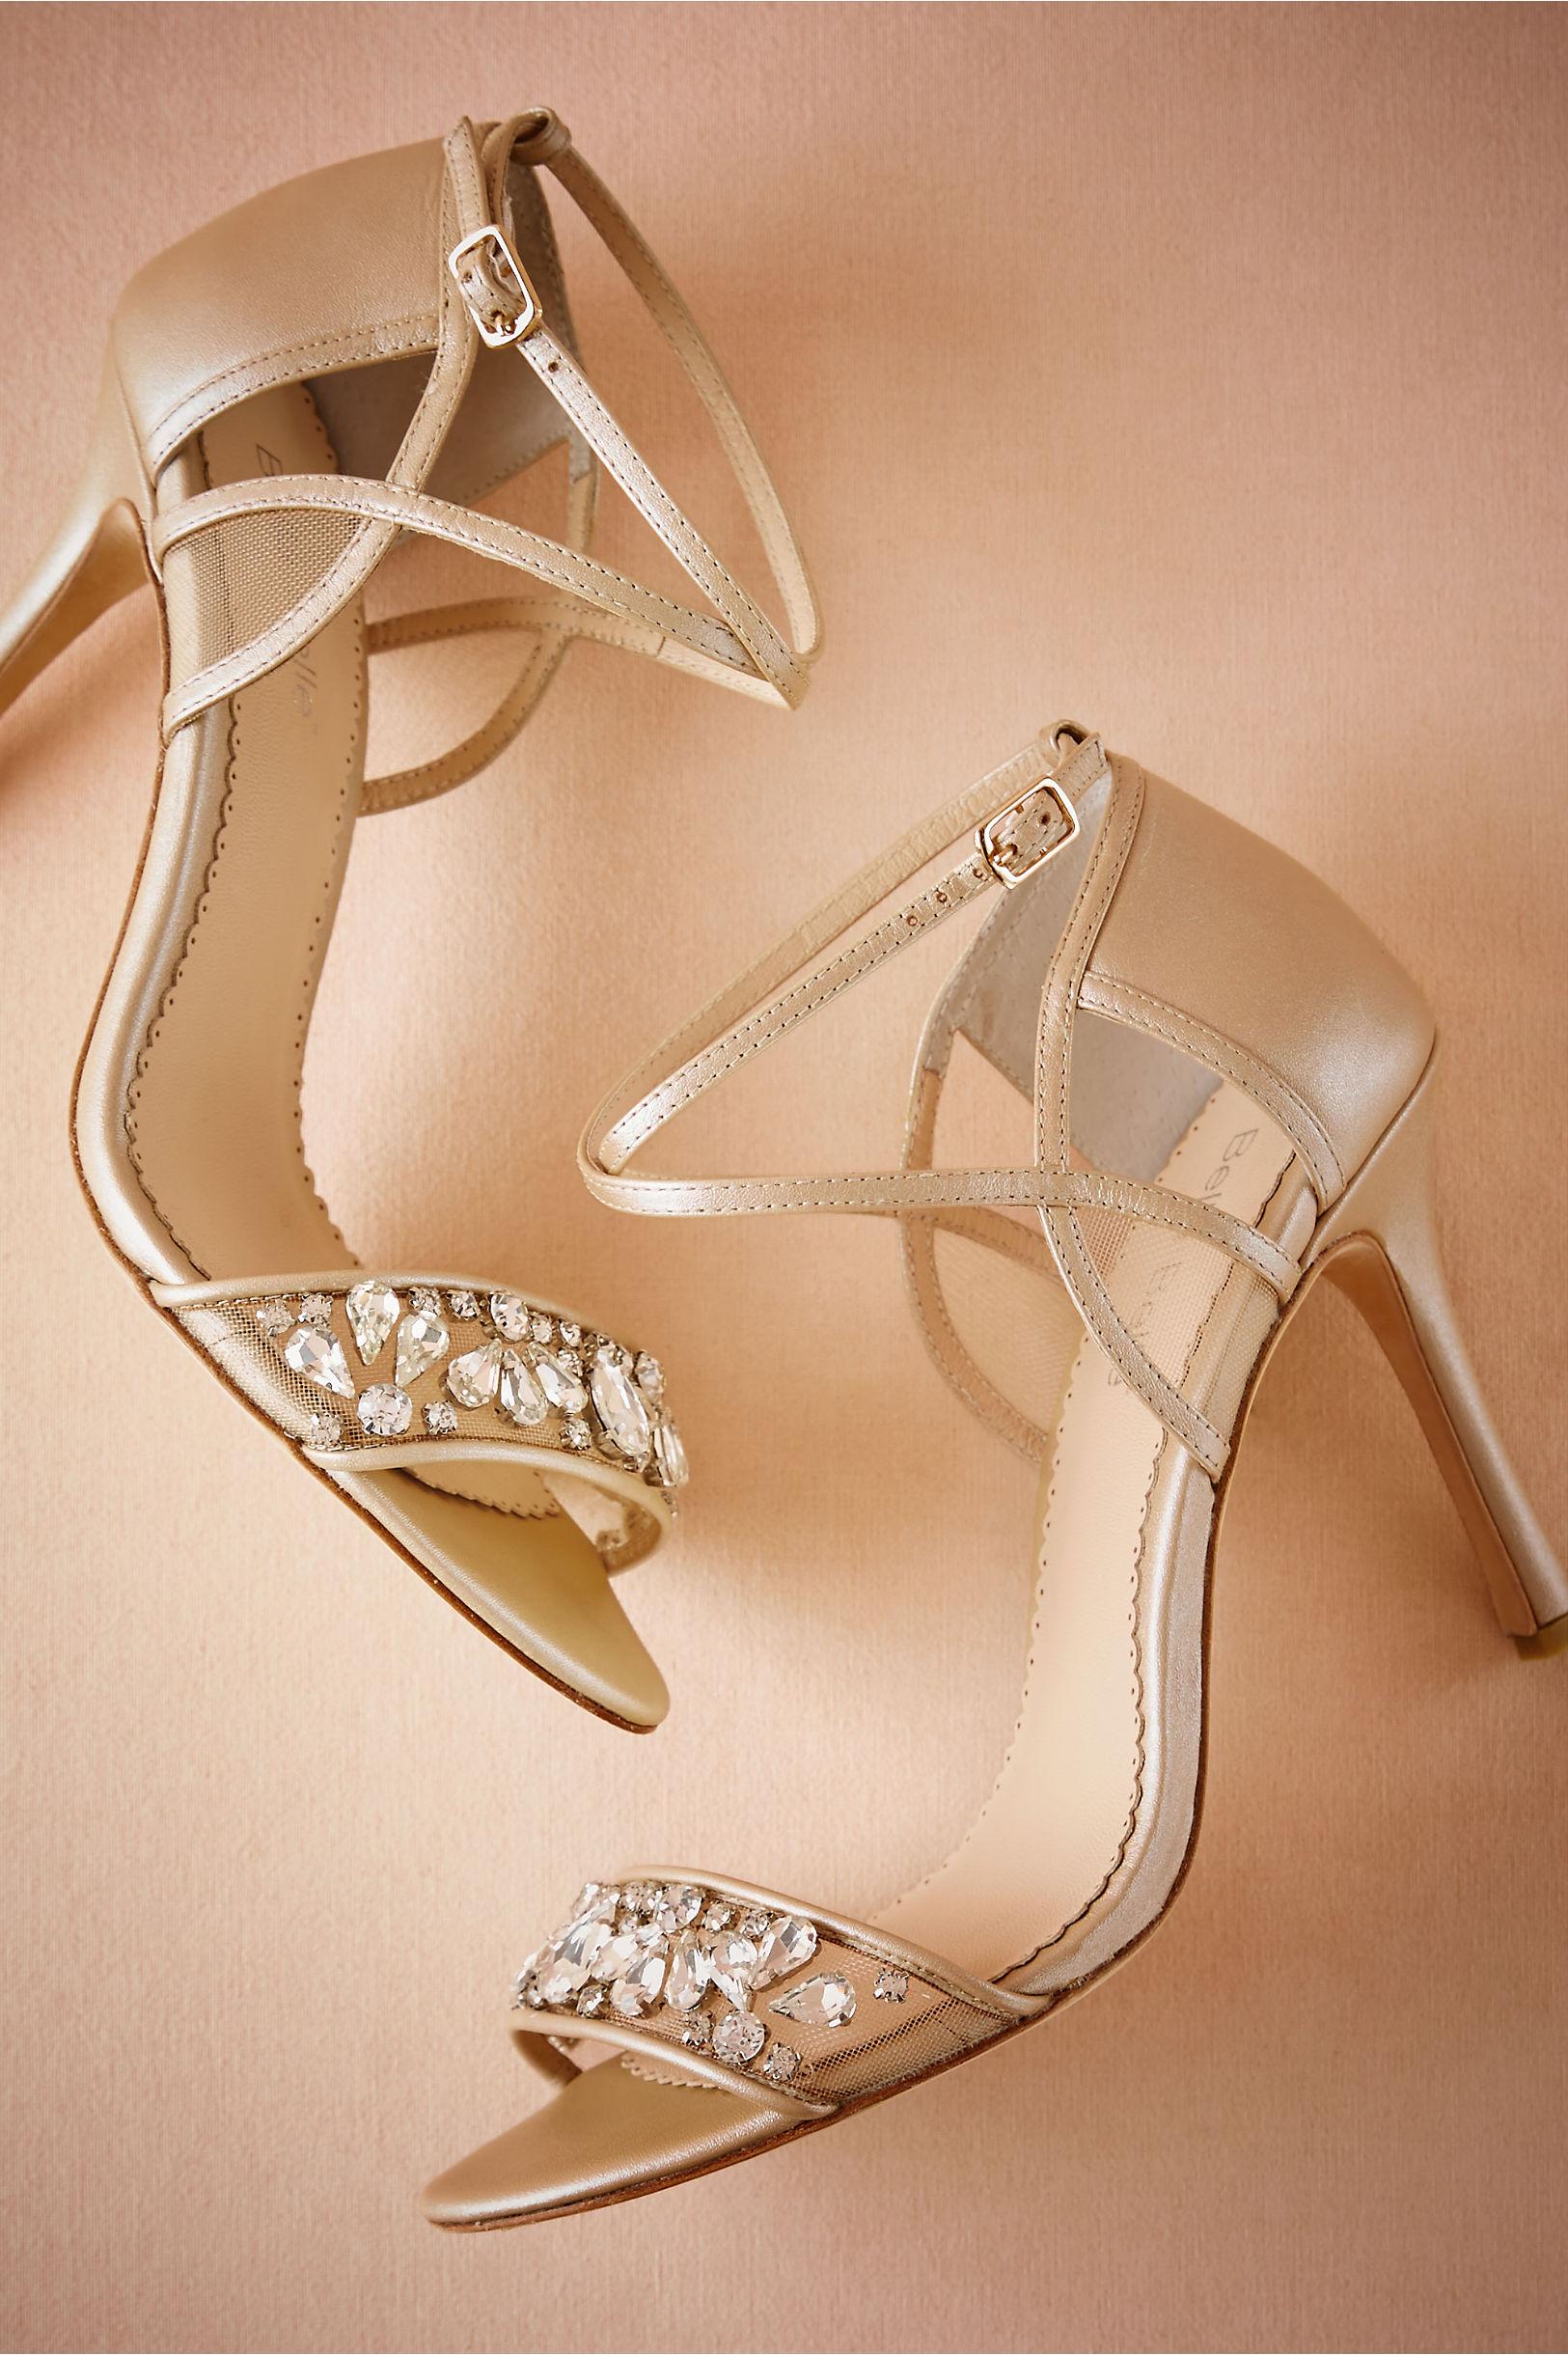 16dc3fa13 BHLDN Pandora Heels in Bridesmaids Bridesmaid Accessories at BHLDN ...